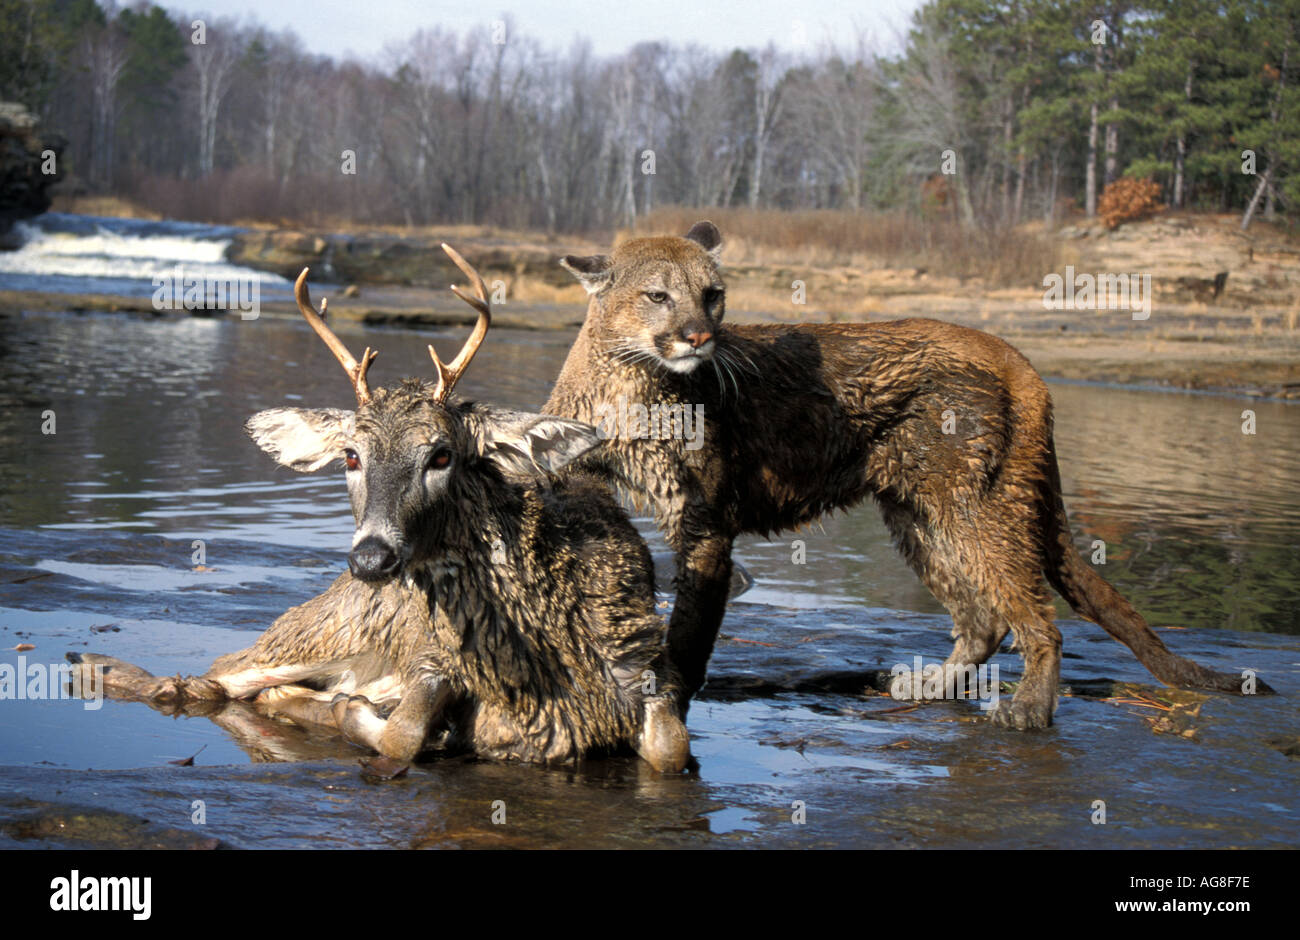 Mountain Lion Puma Cougar Felis concolor Minnesota on deer